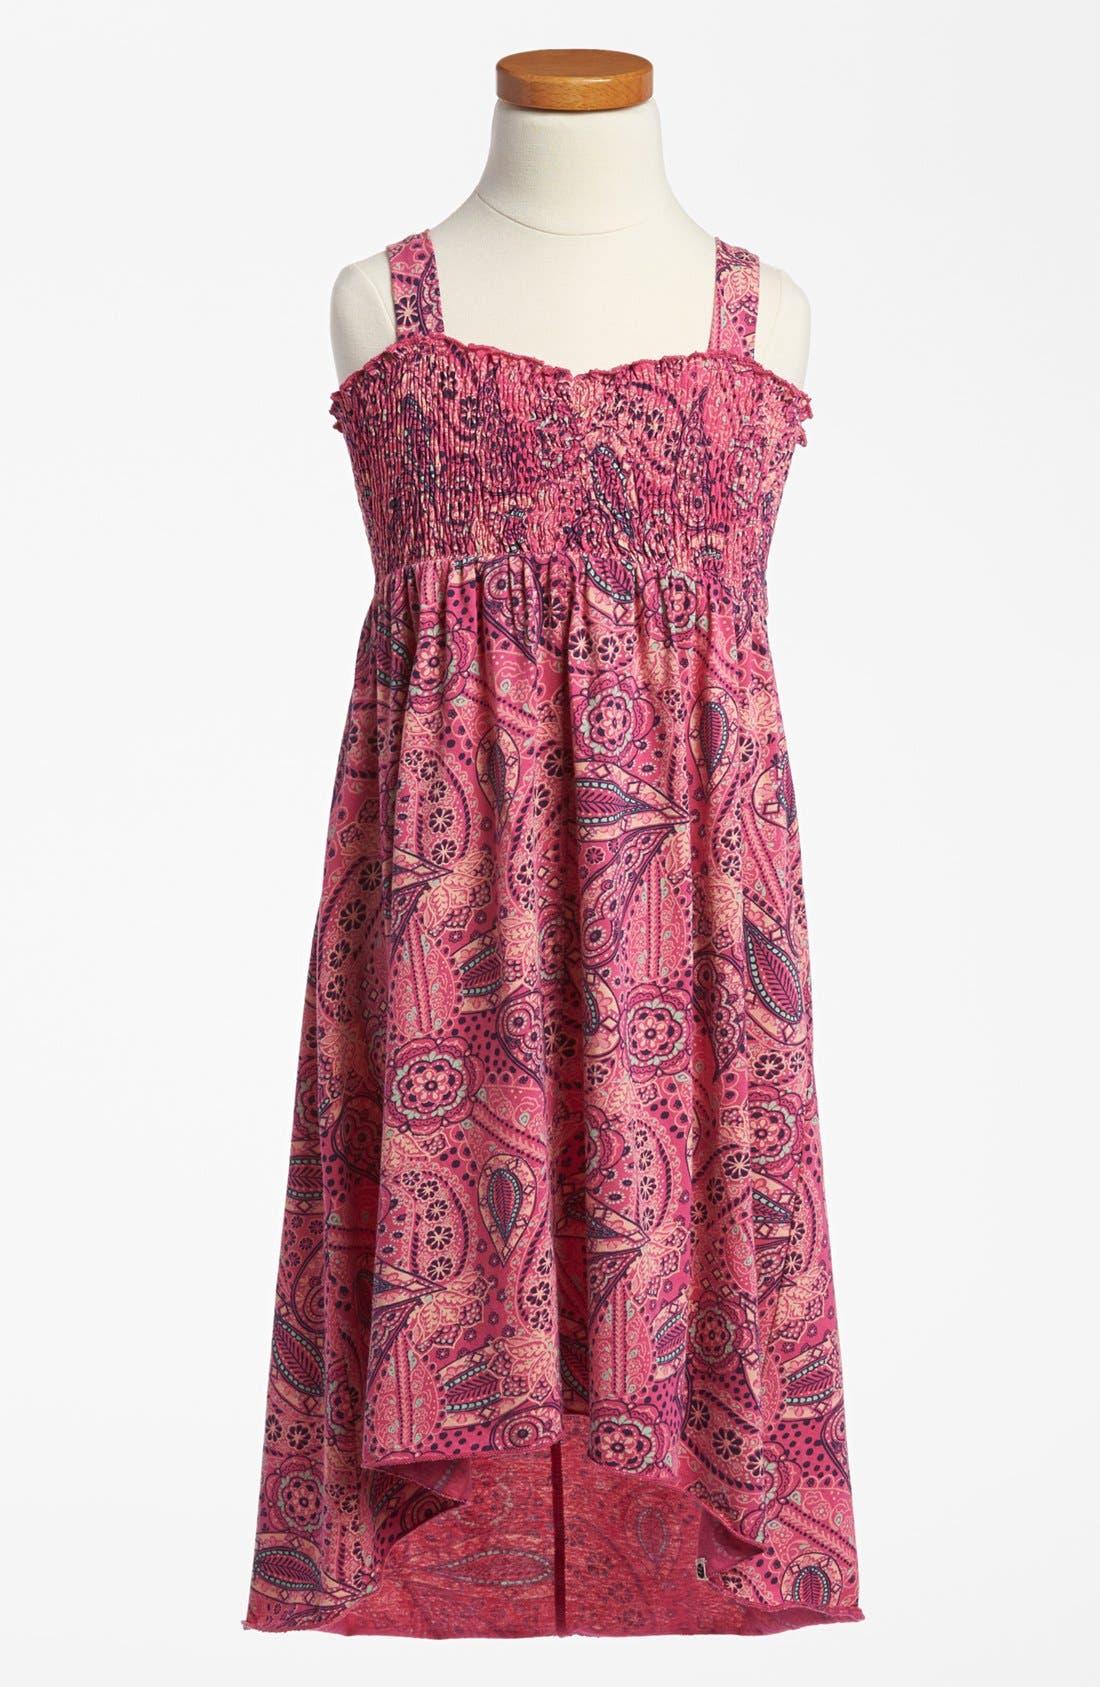 Alternate Image 1 Selected - Billabong 'Washed Away' Dress (Big Girls)